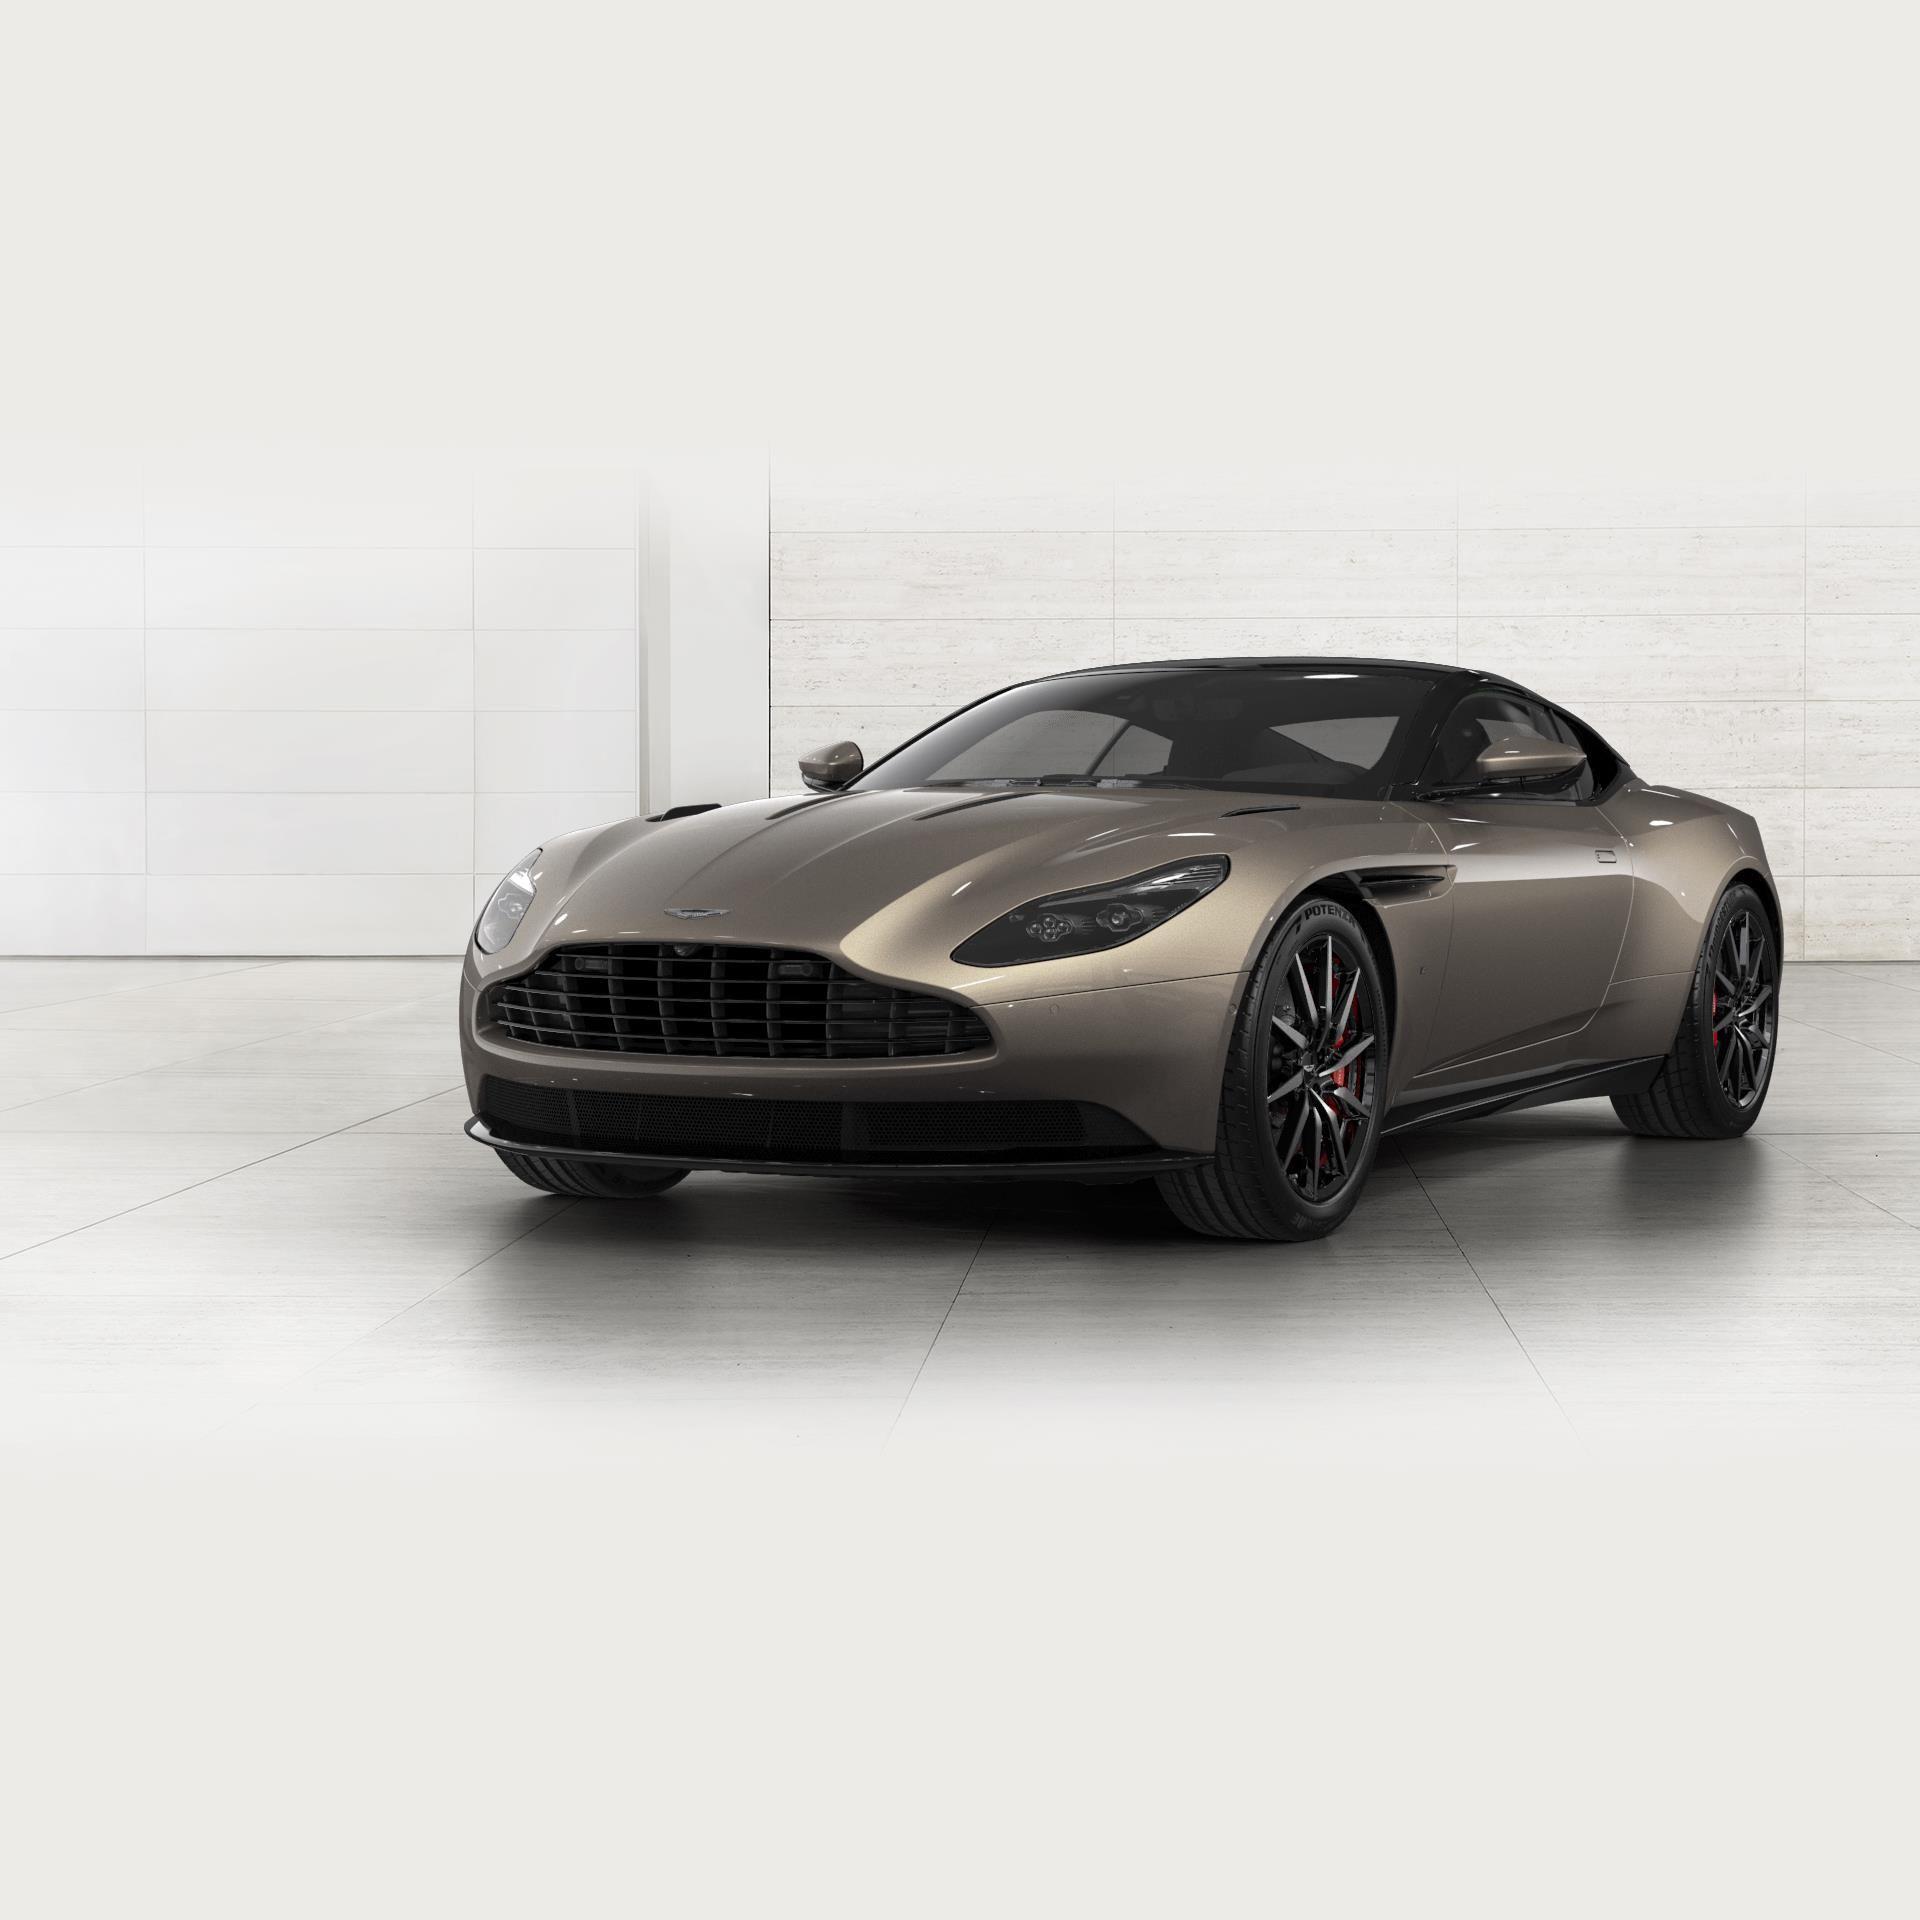 Aston Martin Configurator Aston Martin Aston Martin Db11 Aston